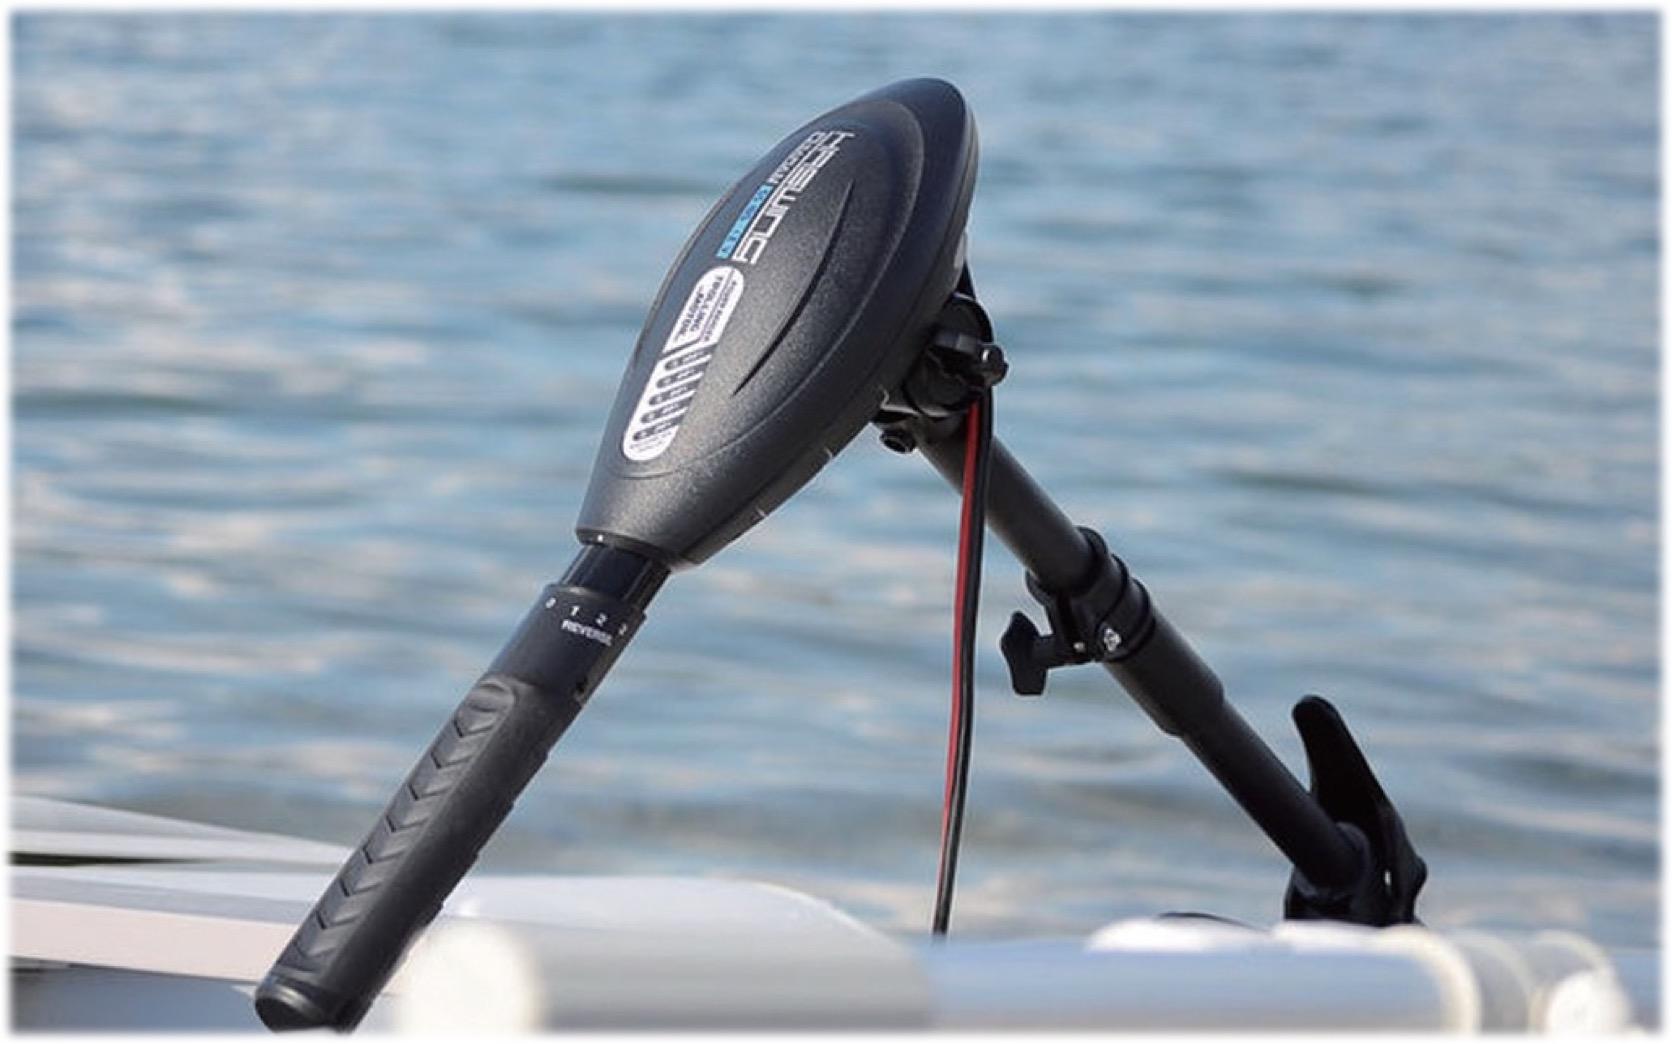 HASWING Osapian30 Electric Outboard Trolling Motor Fishing Boat Dinghy RIB